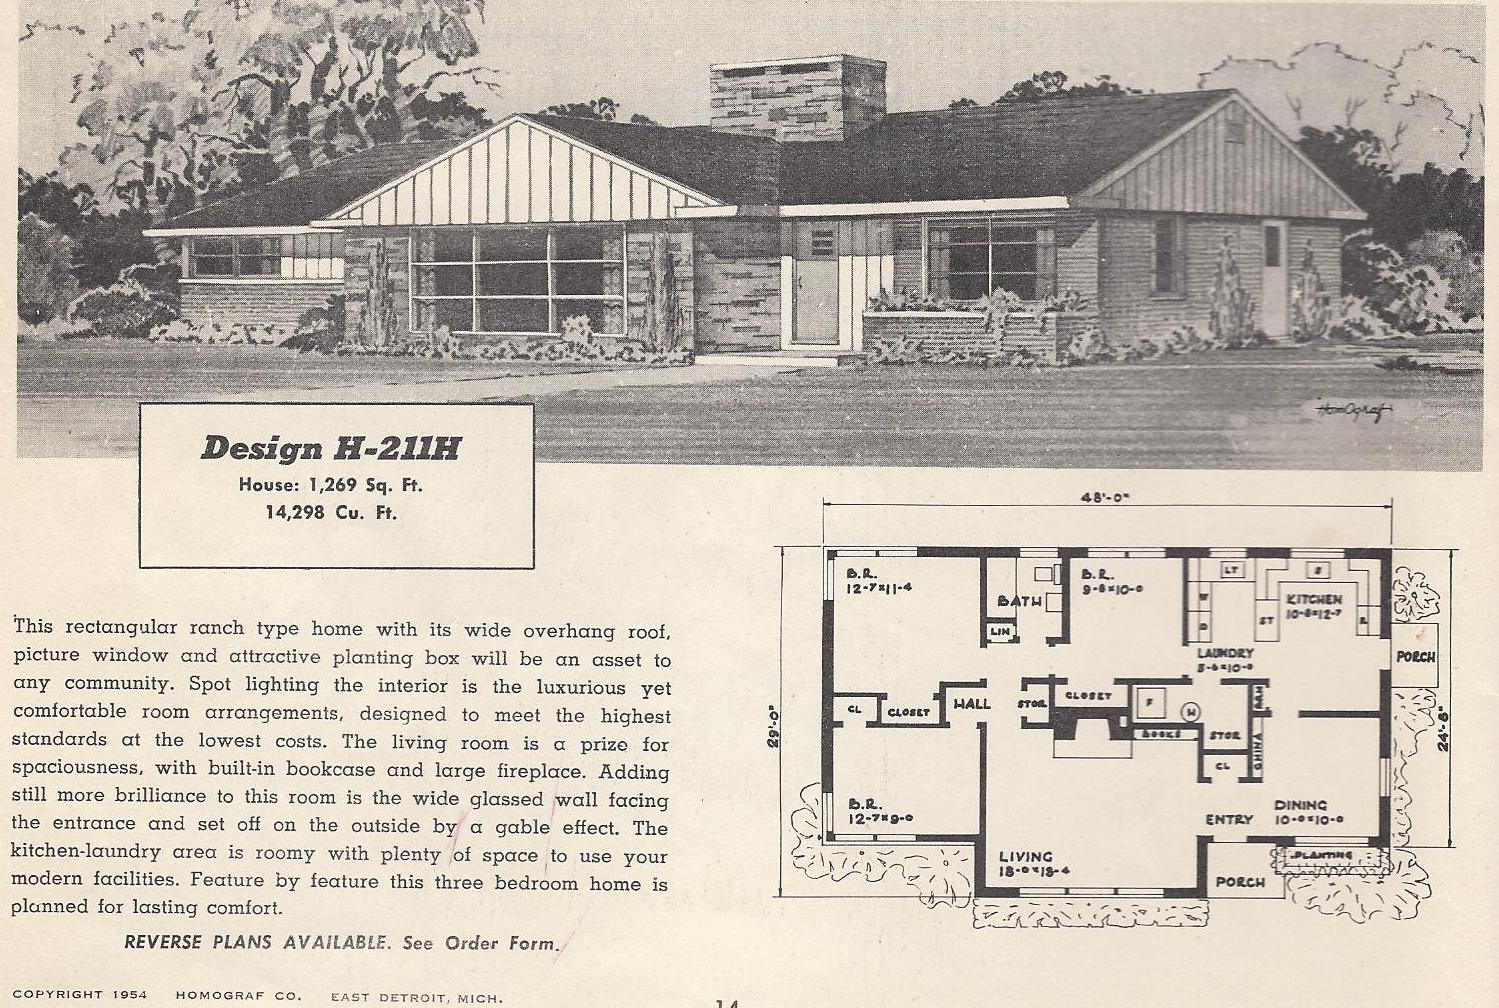 Vintage House Plans 211H | Antique Alter Ego